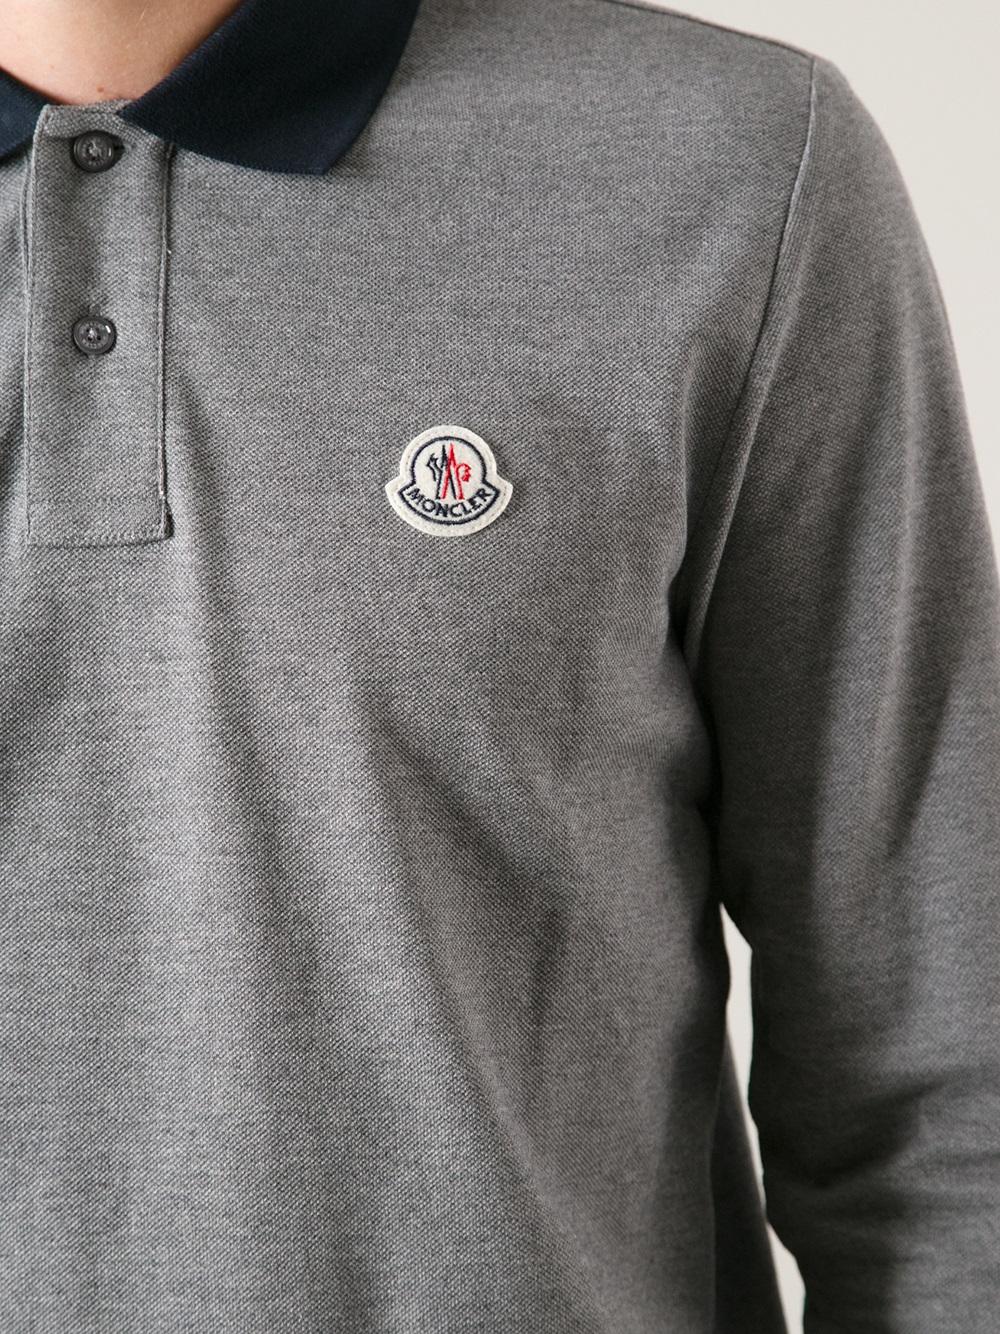 eba883f0769f Moncler Long Sleeve Polo Shirt in Gray for Men - Lyst